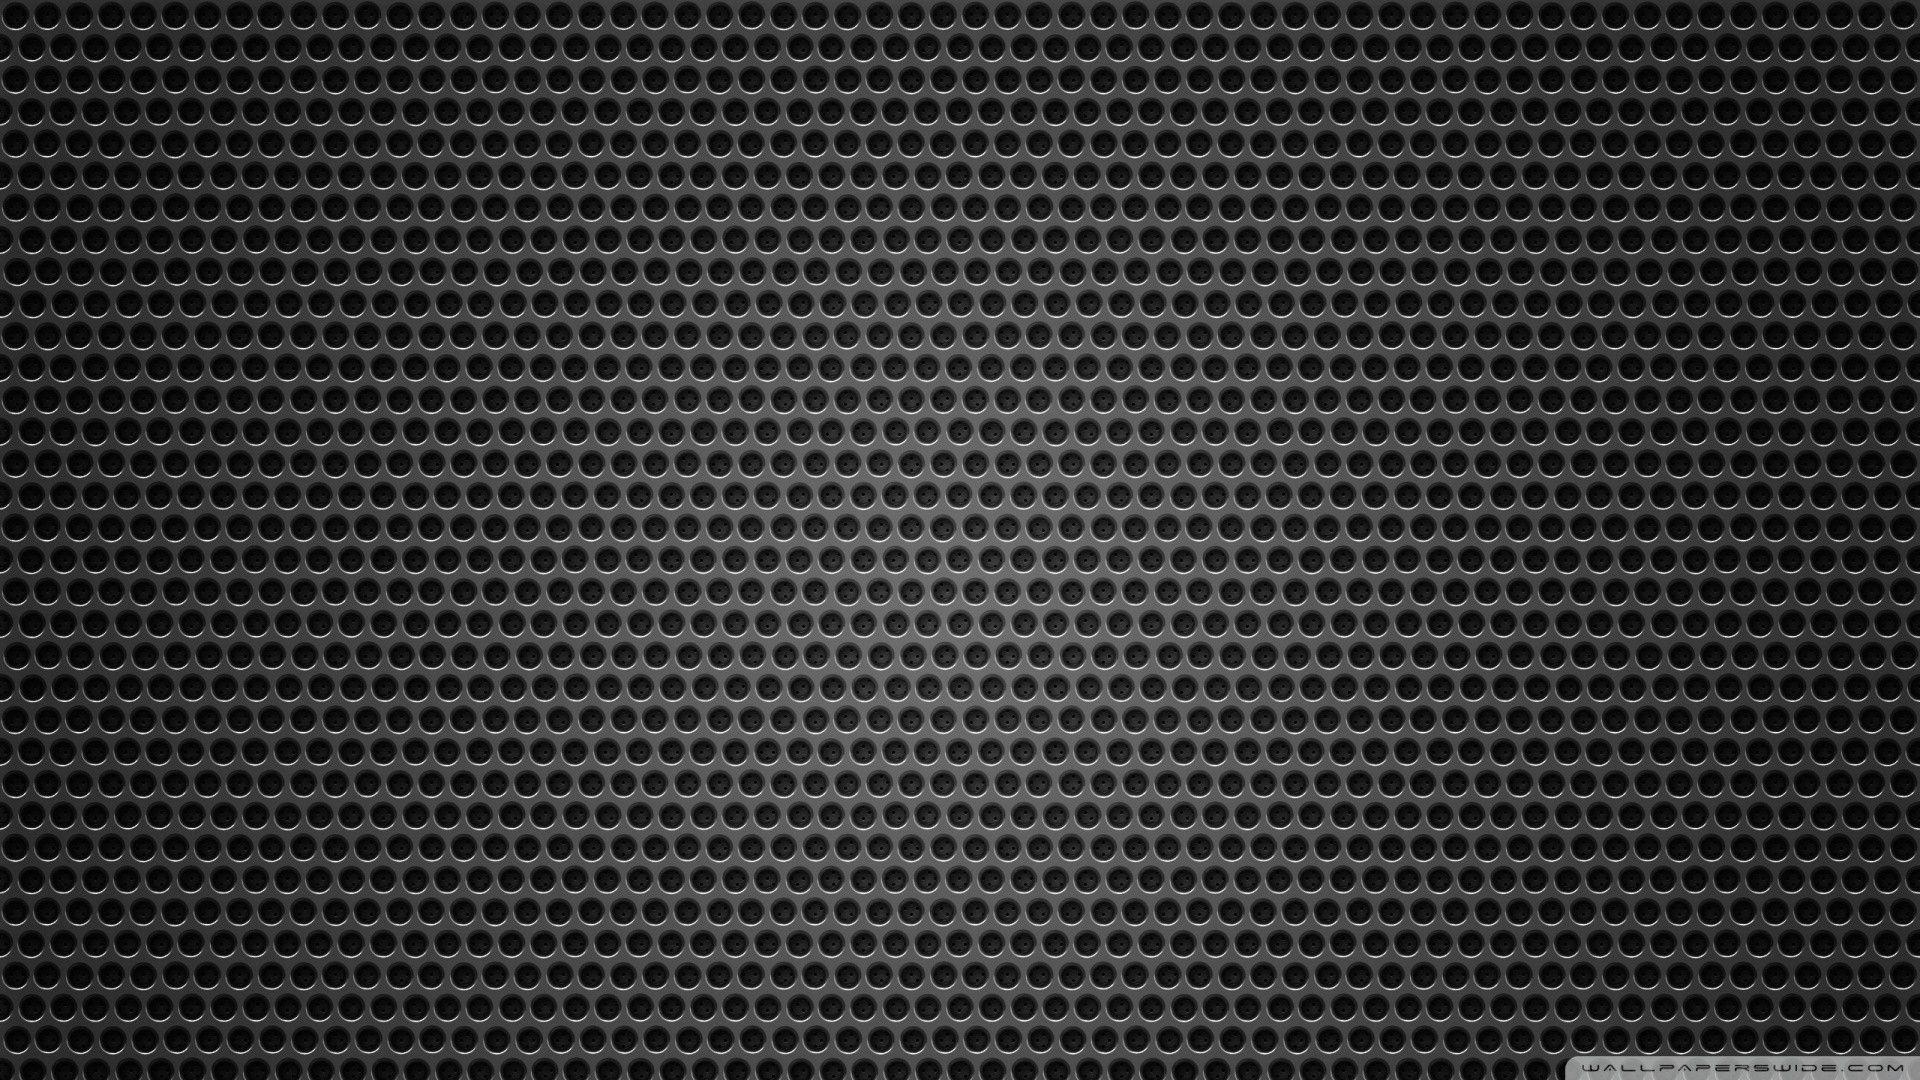 Wallpapers For Black Brushed Metal Wallpaper 1920x1080